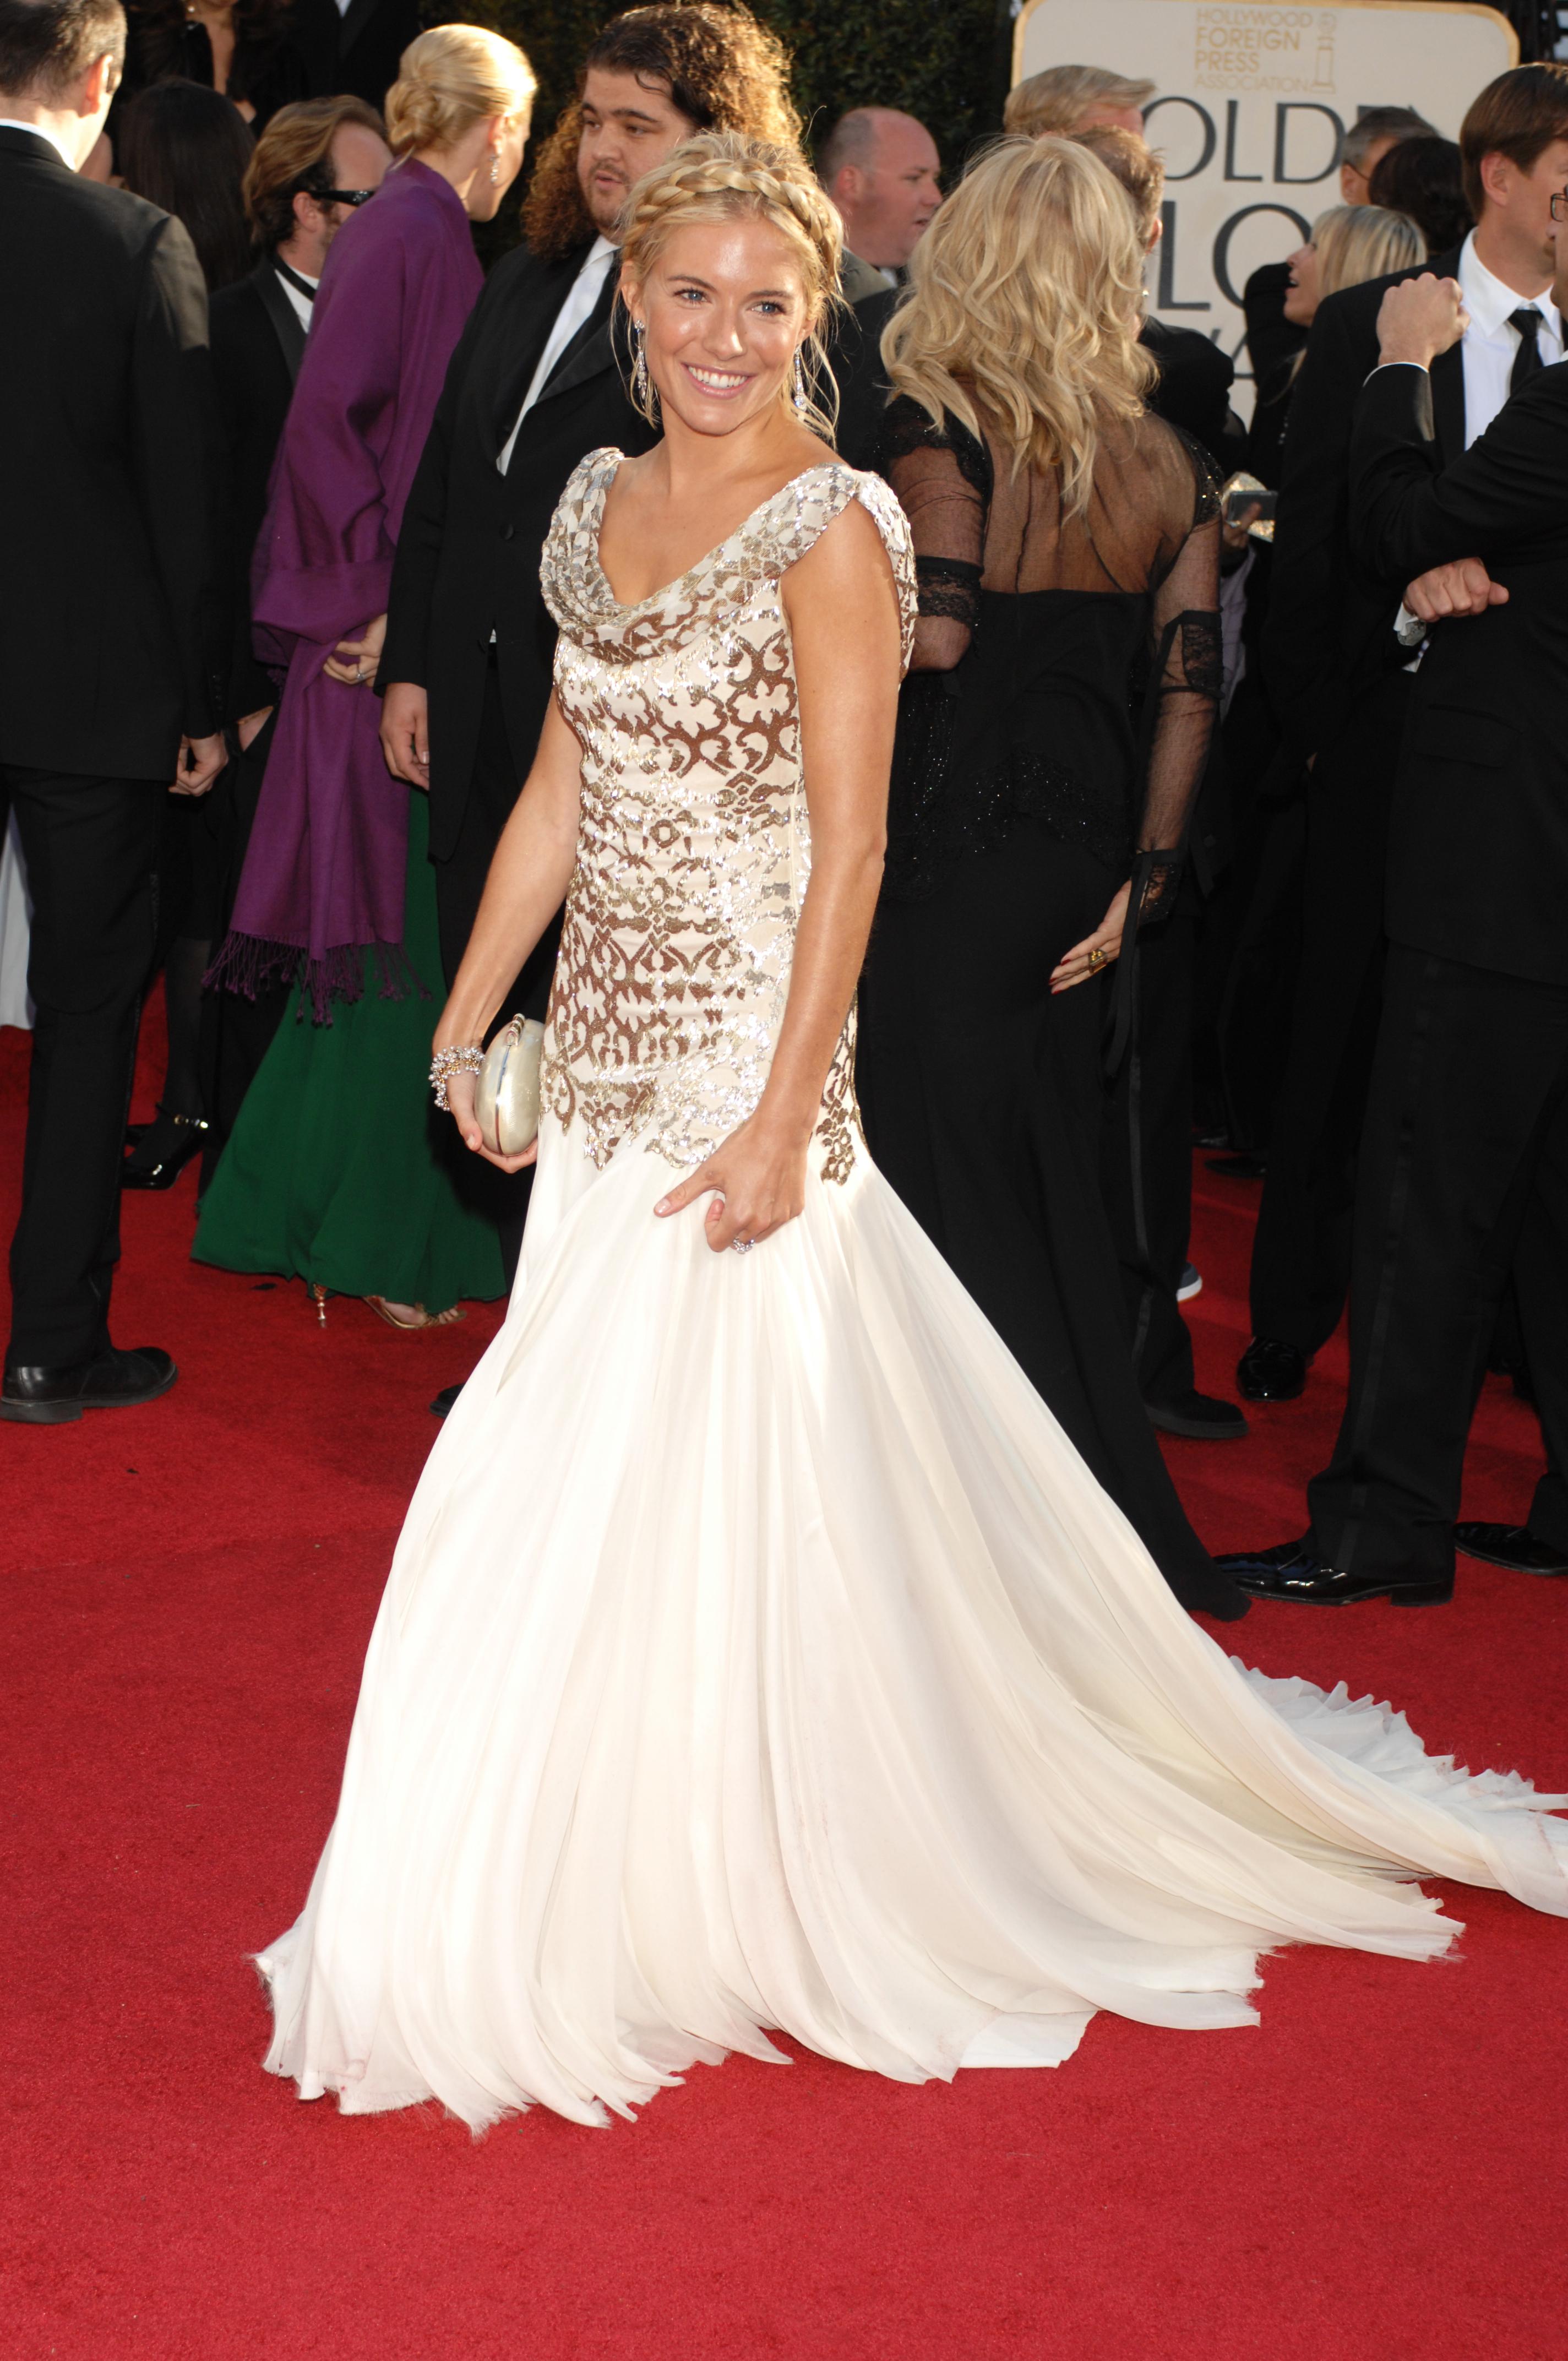 USA - 64th Annual Golden Globe Awards - Arrivals